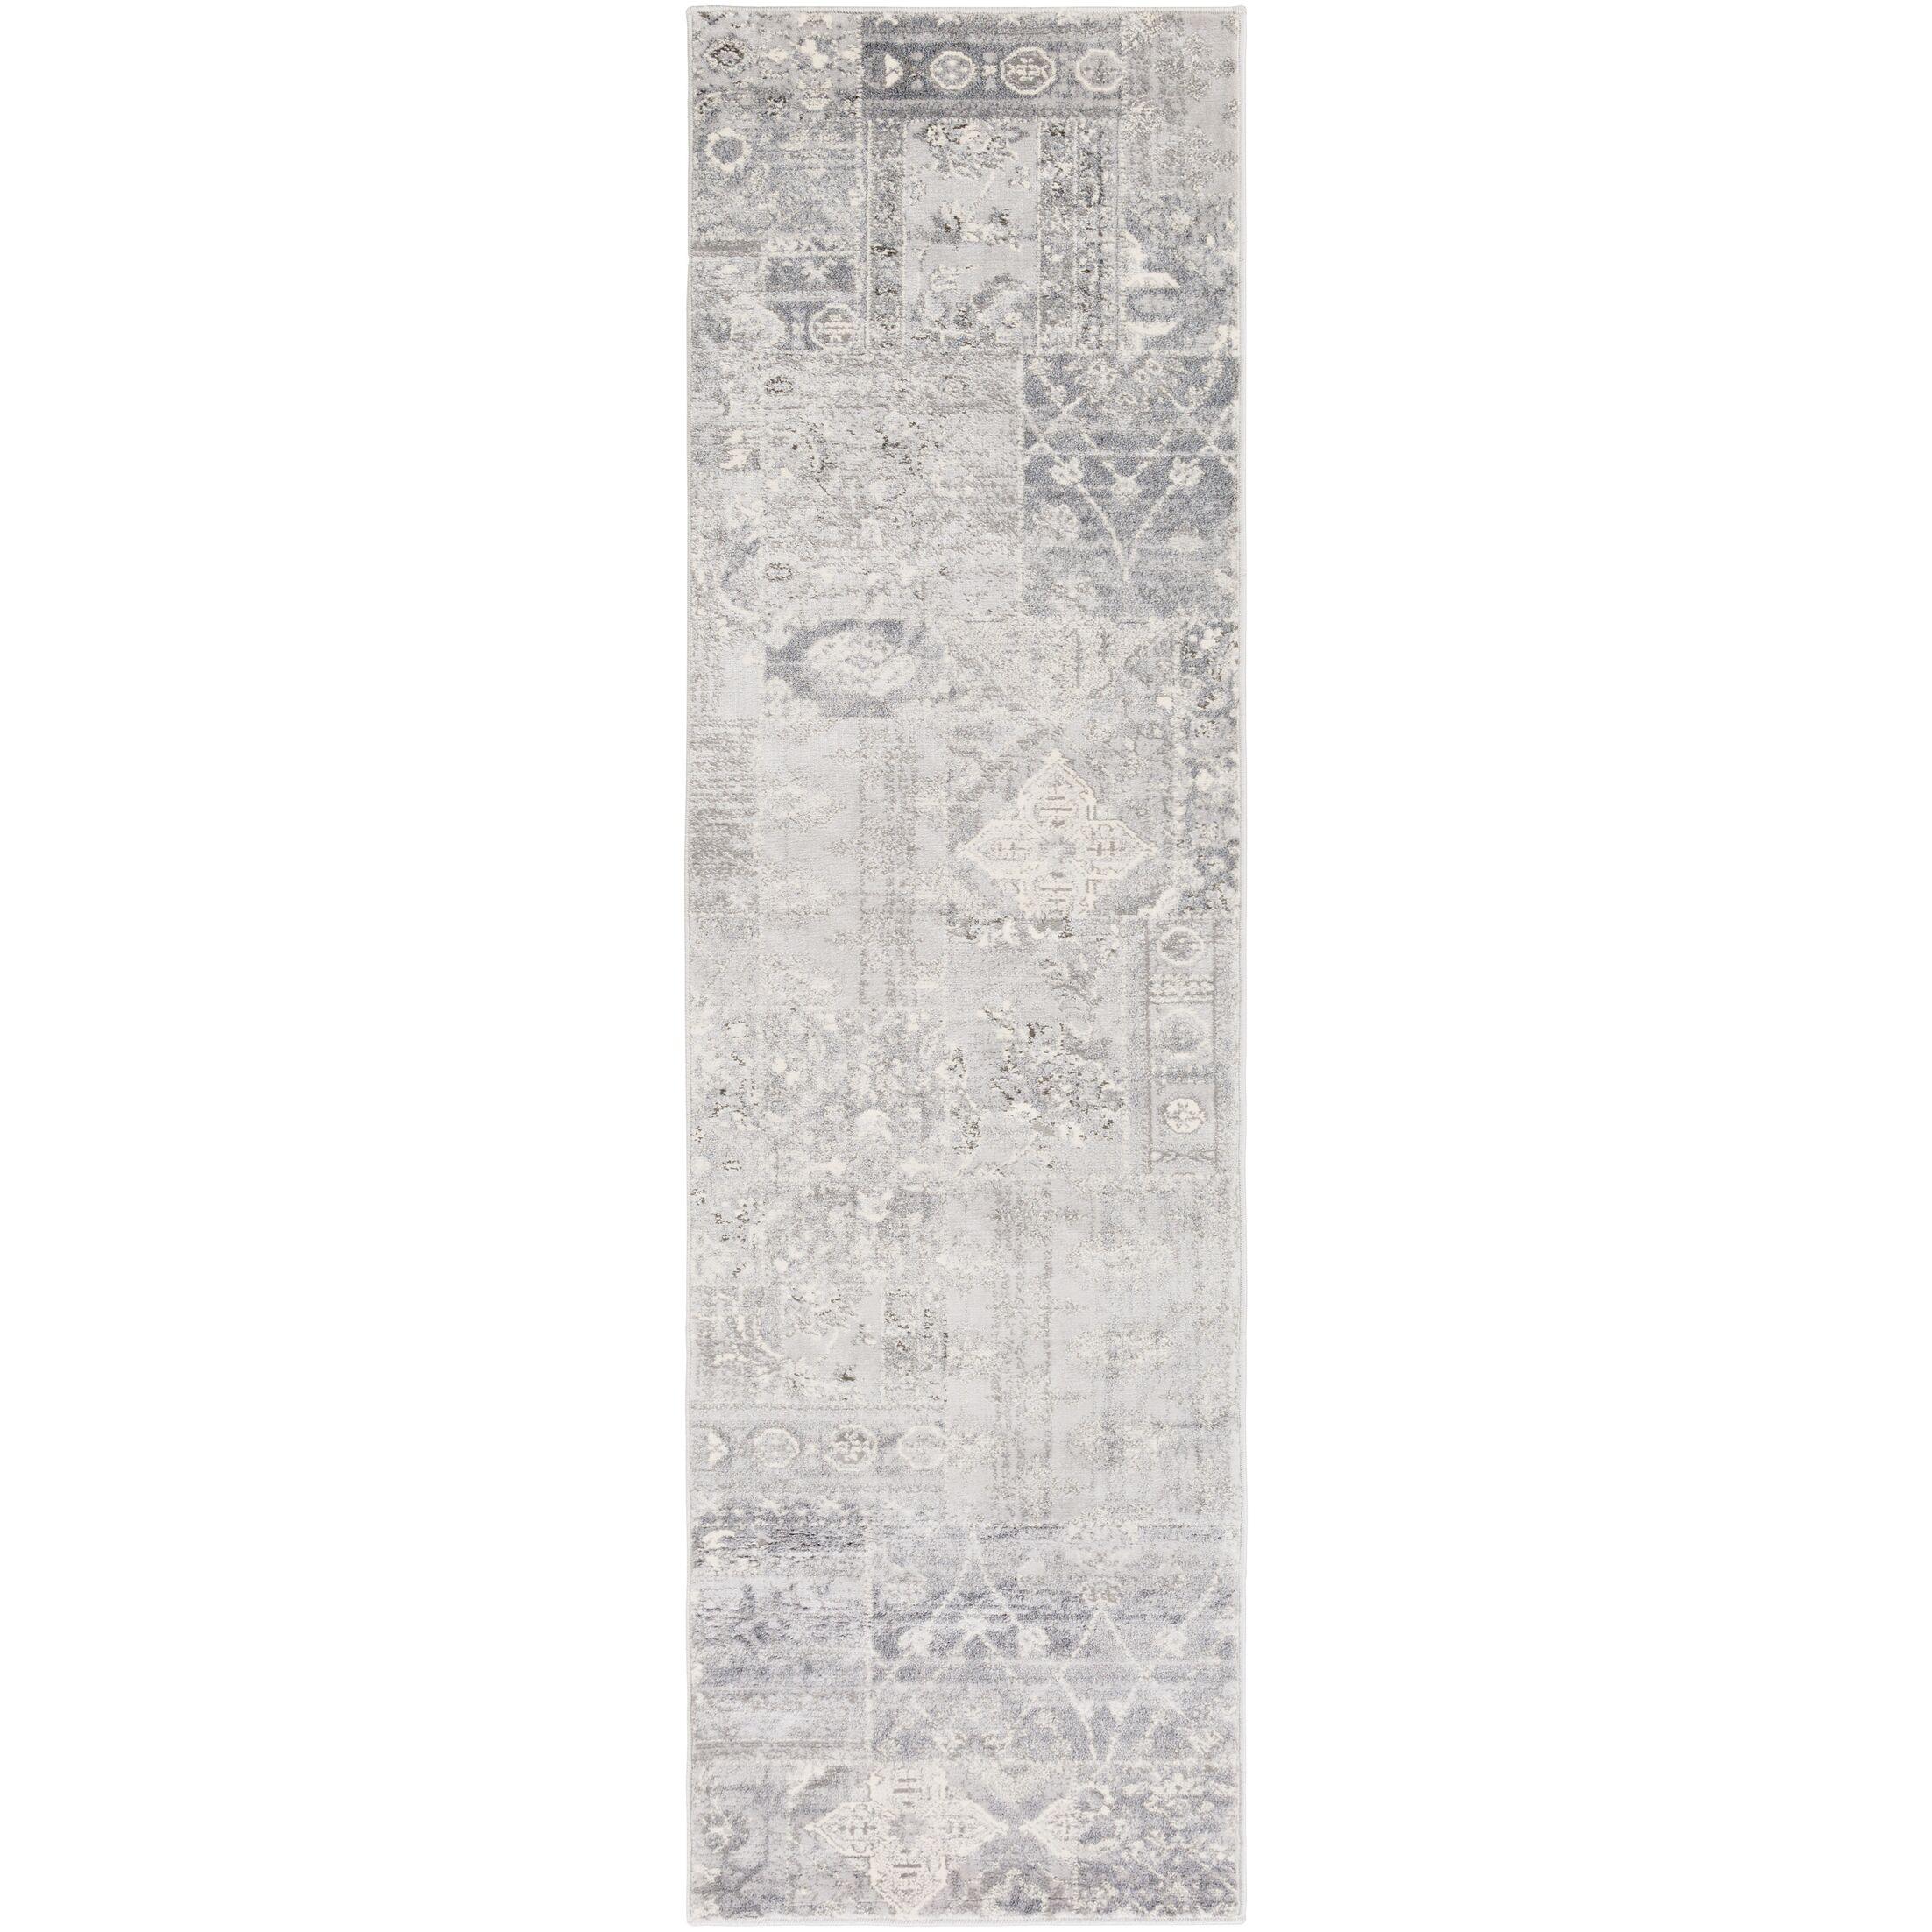 Hatboro Metallic/Gray Area Rug Rug Size: Runner 2'3